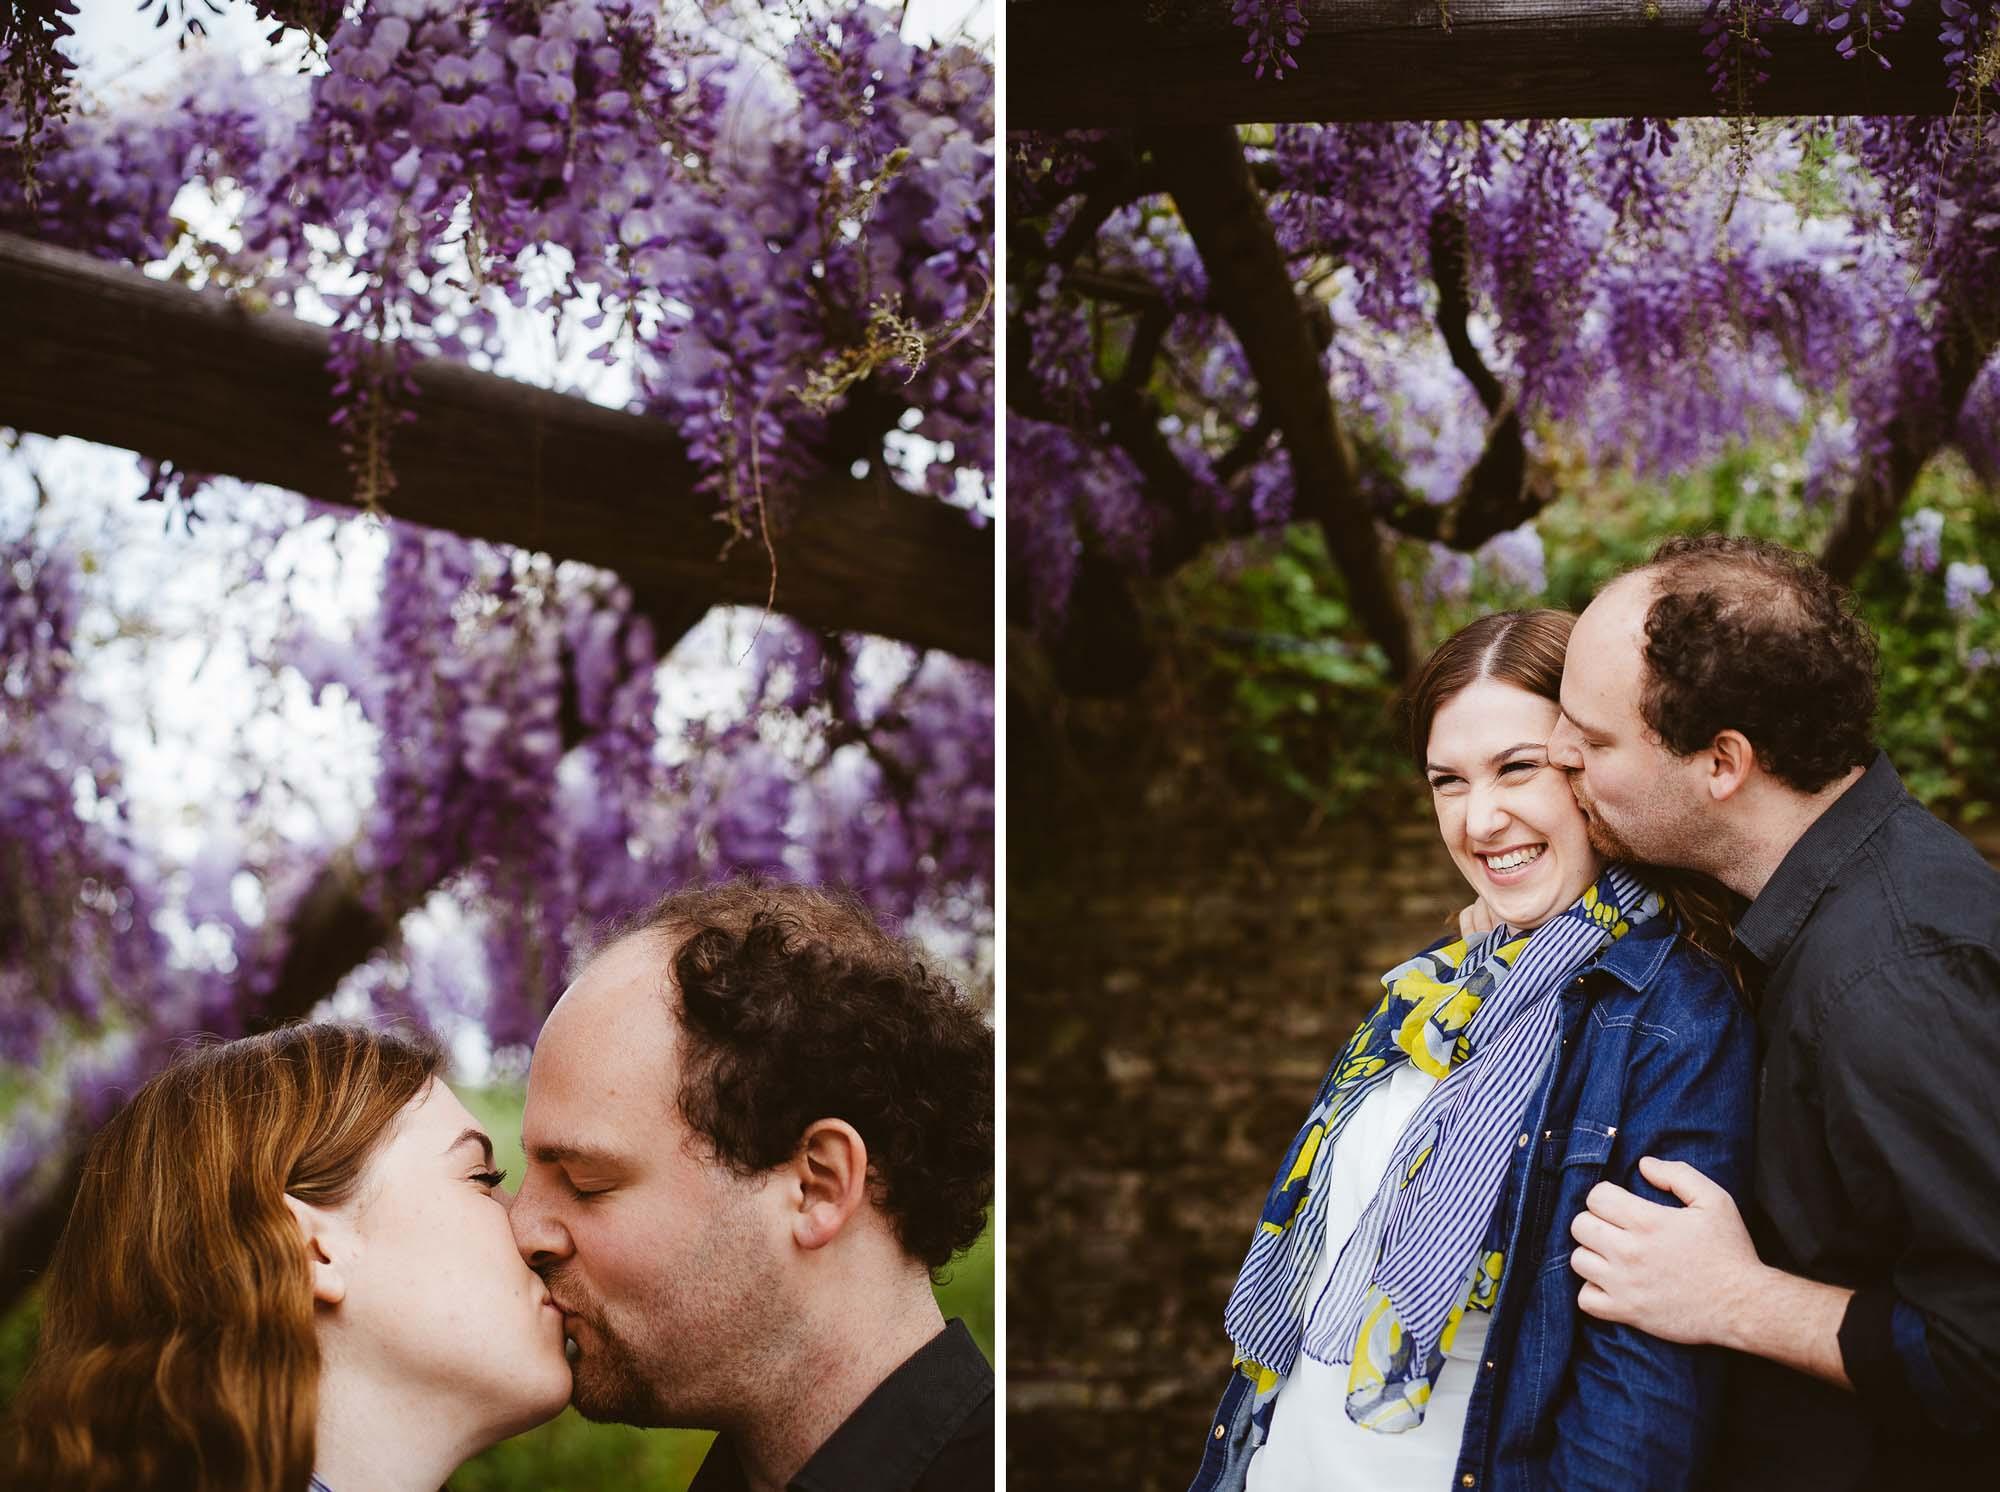 Paarshooting Engagement Shooting Hochzeitsfotograf Stuttgart Oliver Lichtblau Helen Sebastian 16